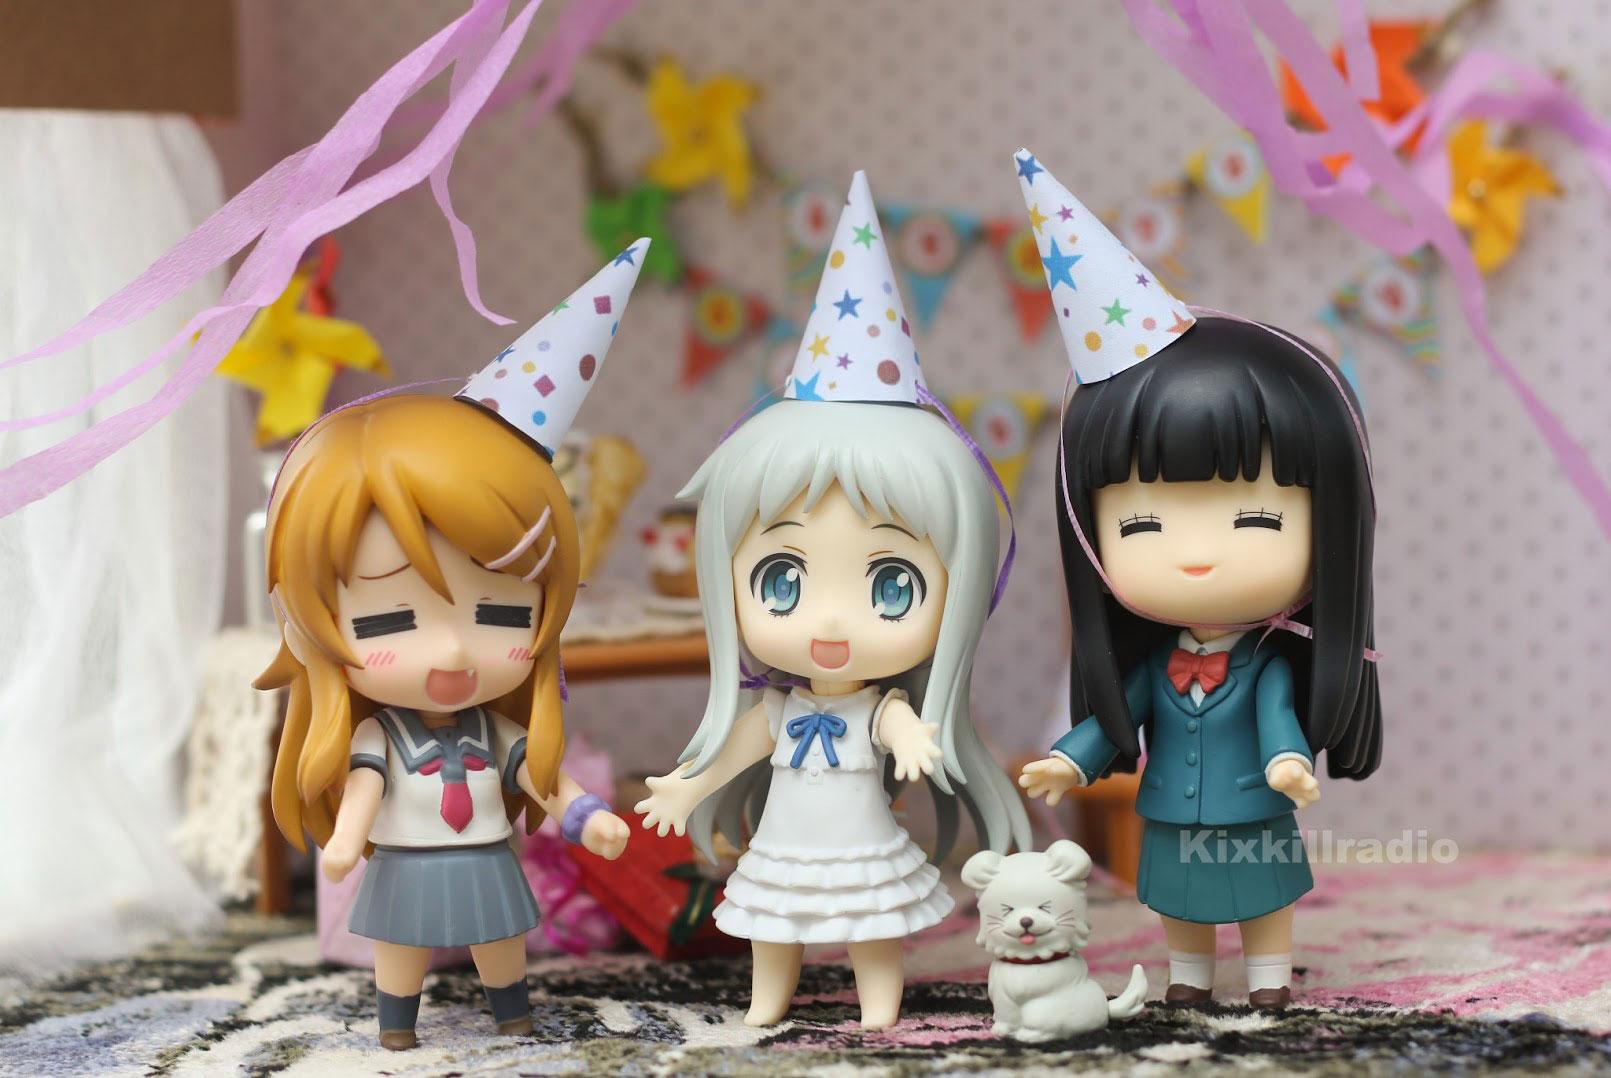 Nendoroid Mirai Suenega birthday party